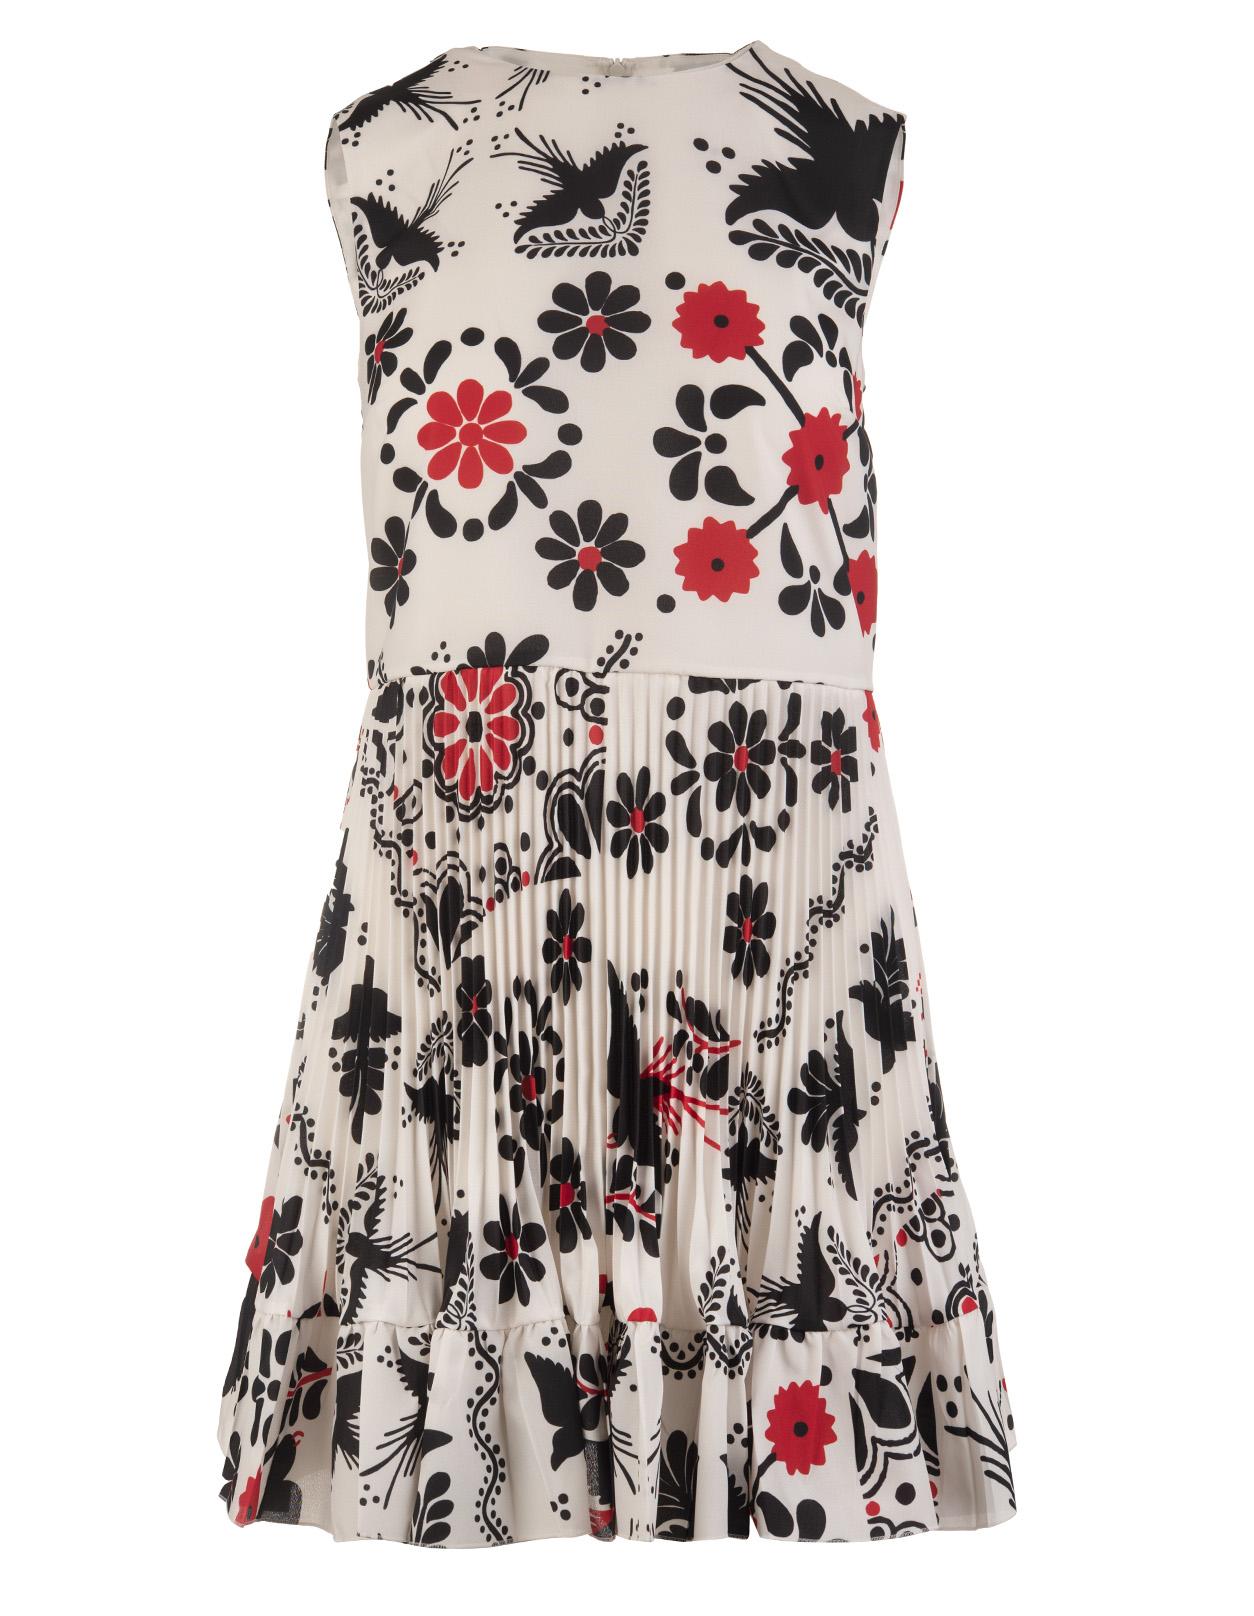 3dab31a4651 Pleated skirt Dress - RED VALENTINO - Russocapri